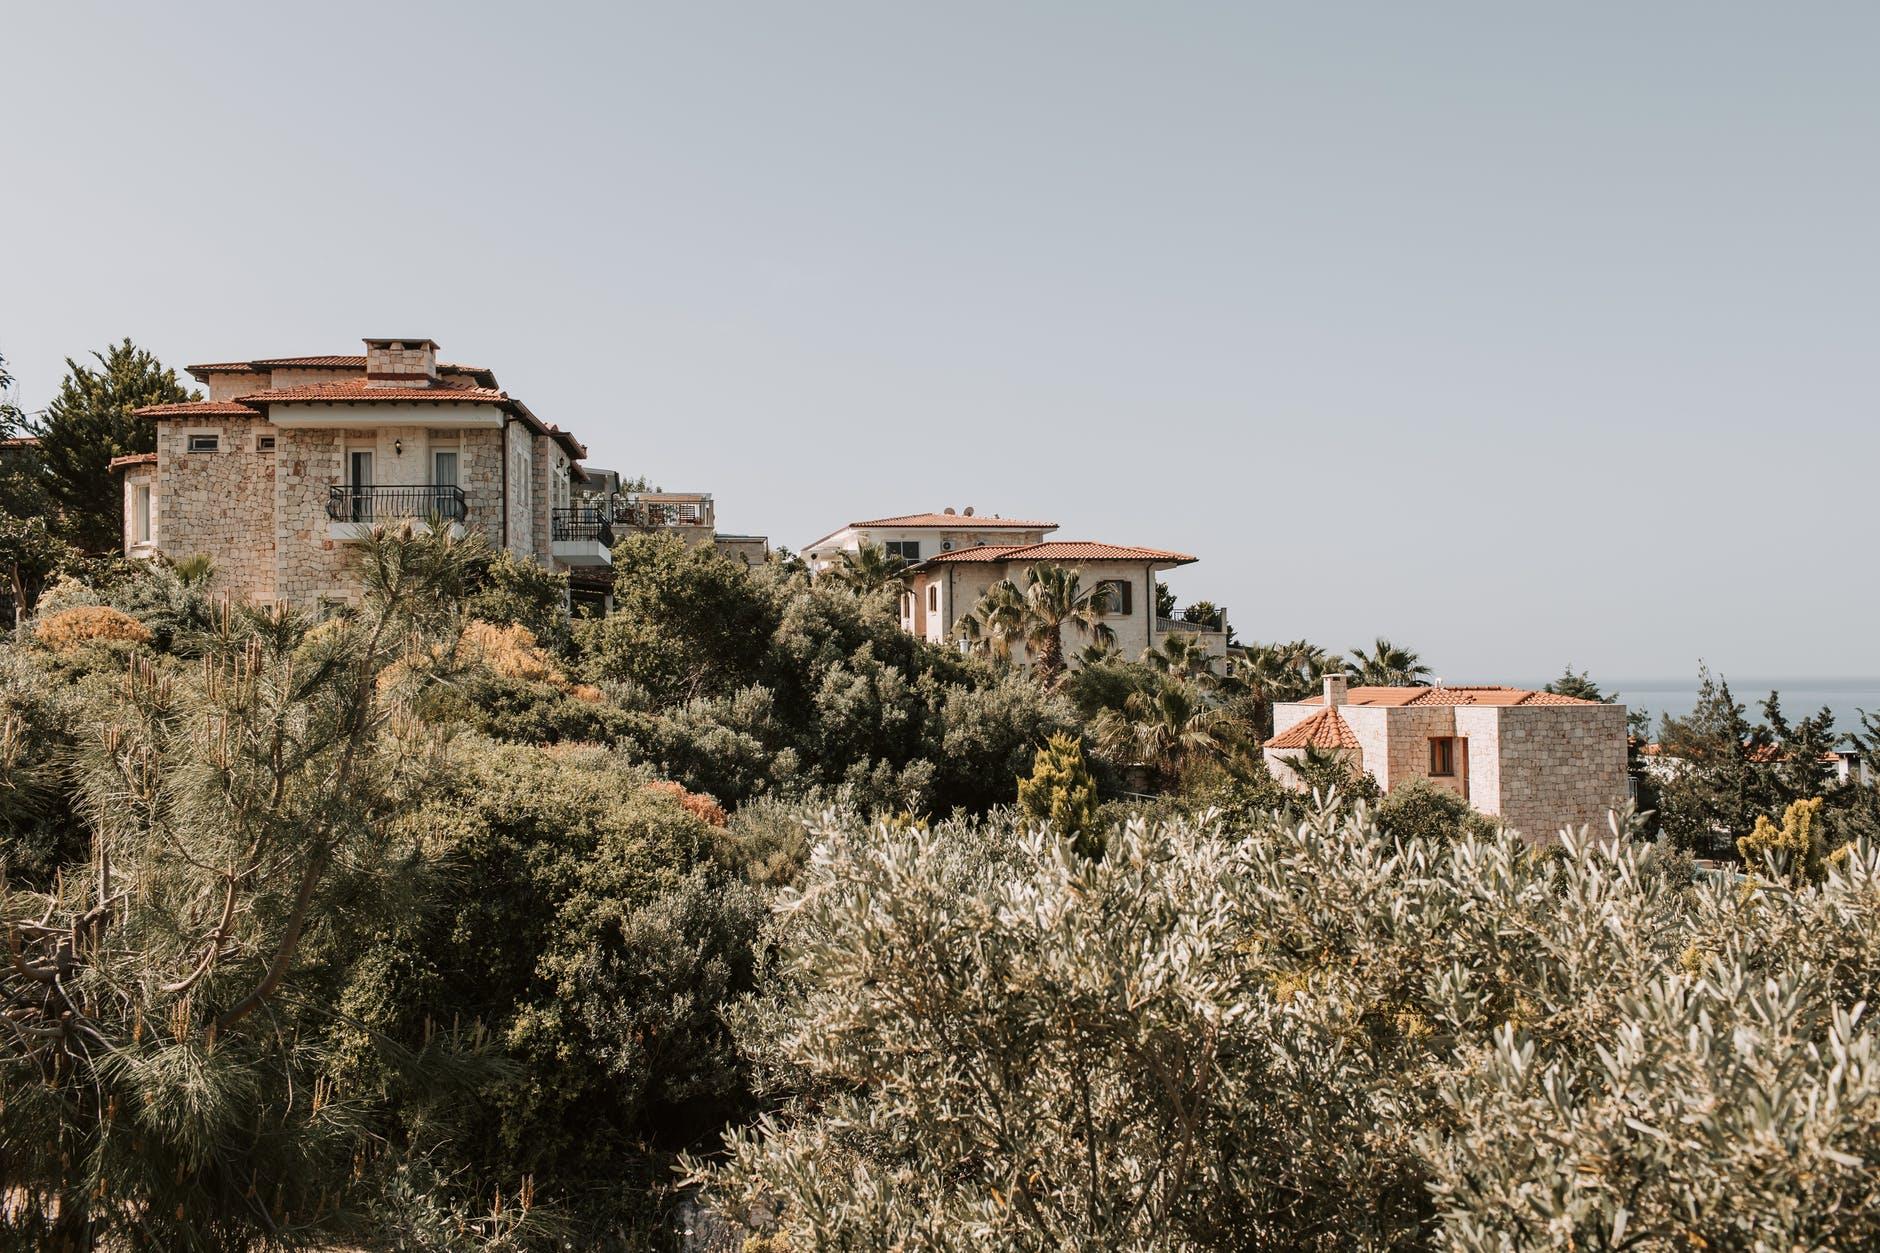 concrete houses built on a mountain